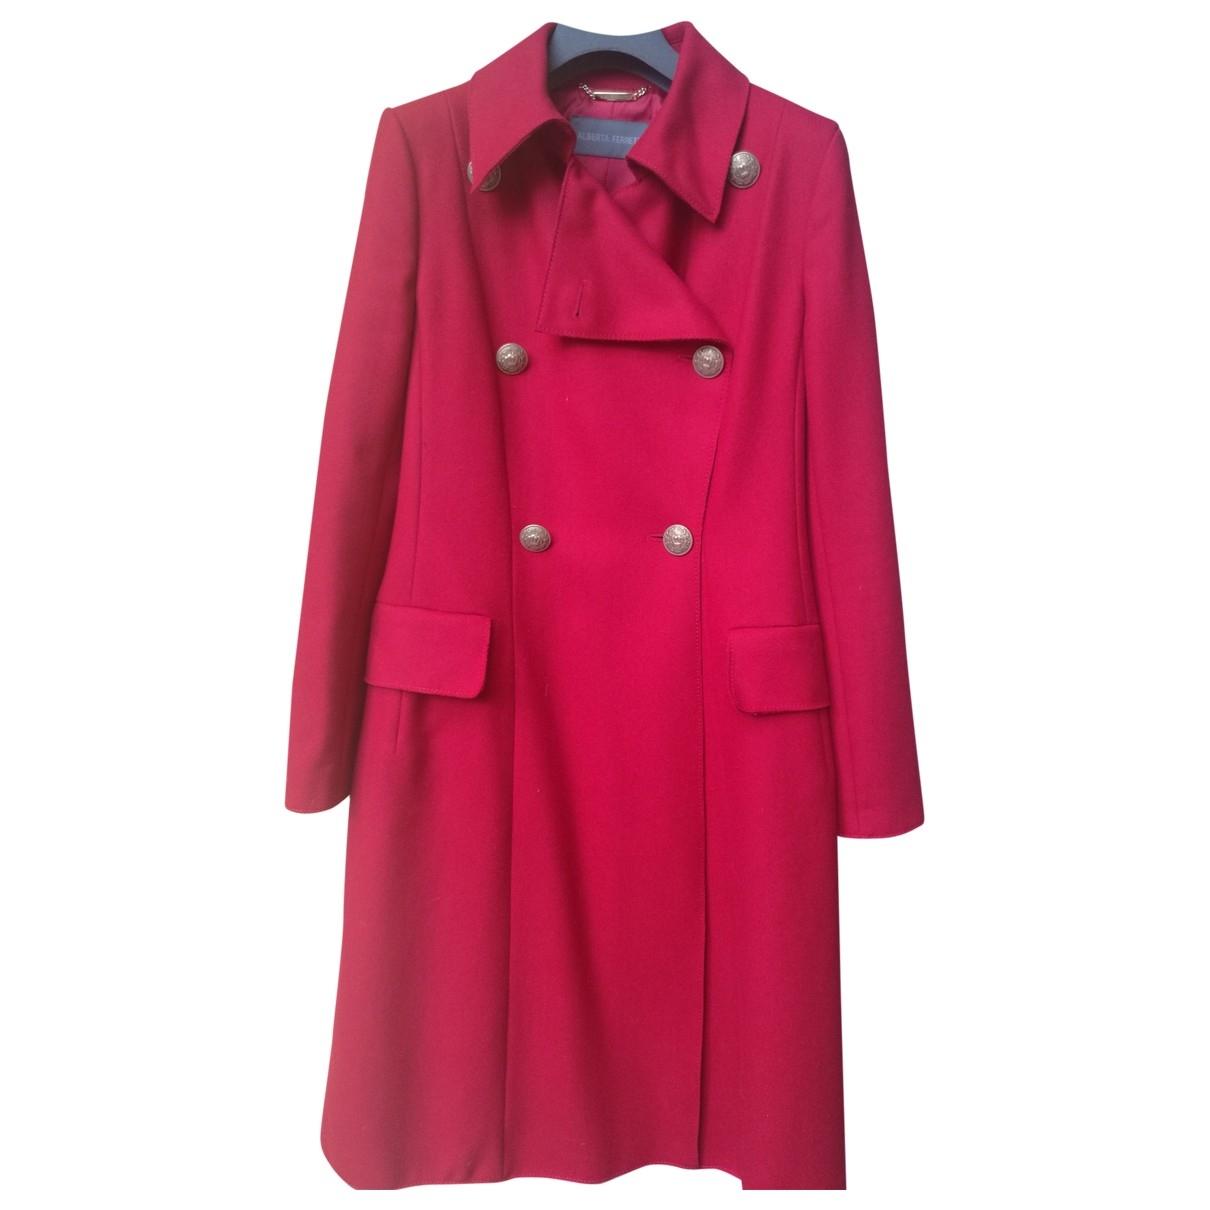 Alberta Ferretti \N Red Wool coat for Women 40 IT